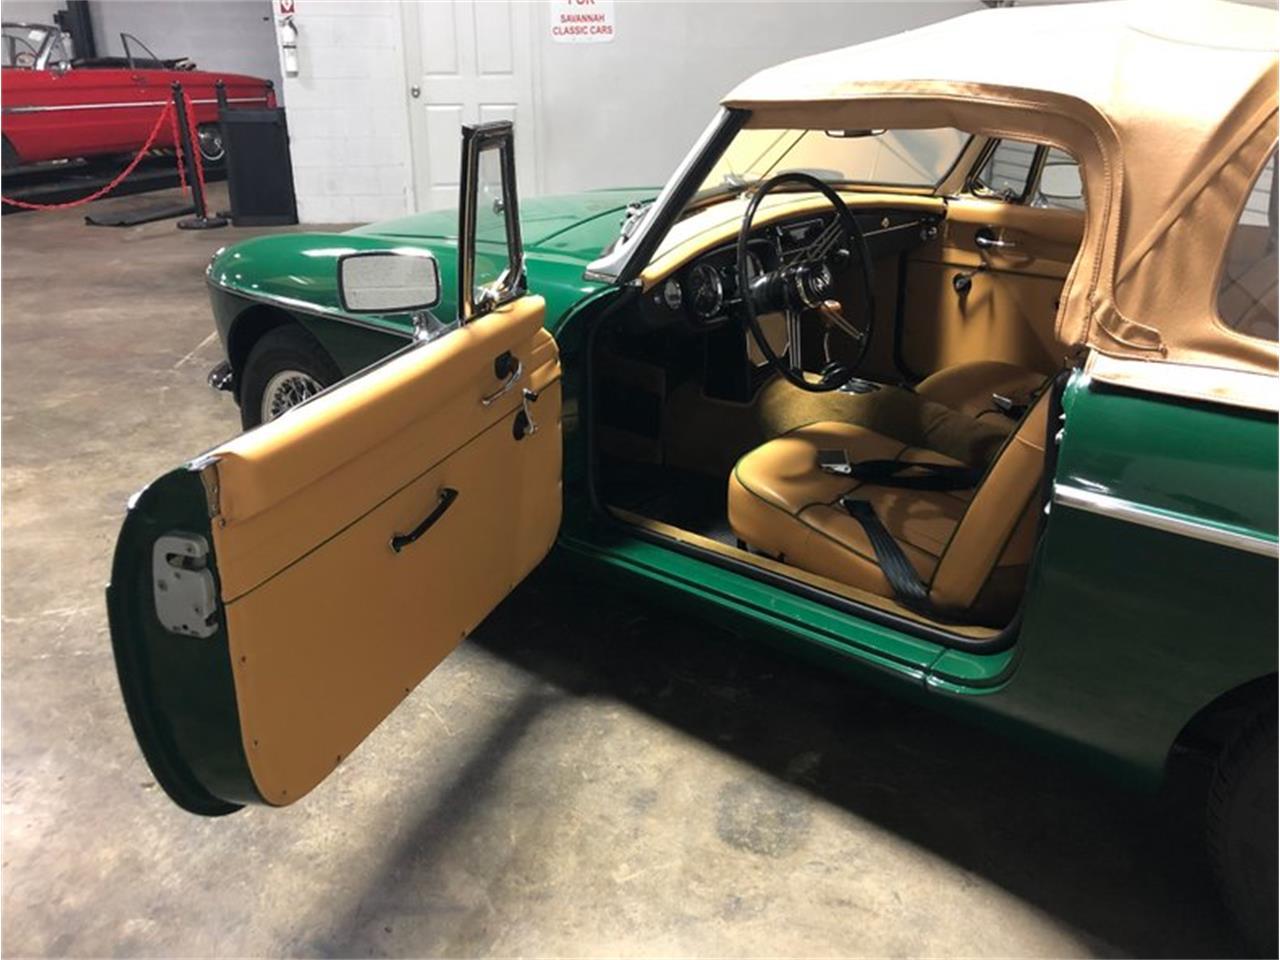 1967 MG MGB for sale in Savannah, GA / ClassicCarsBay com